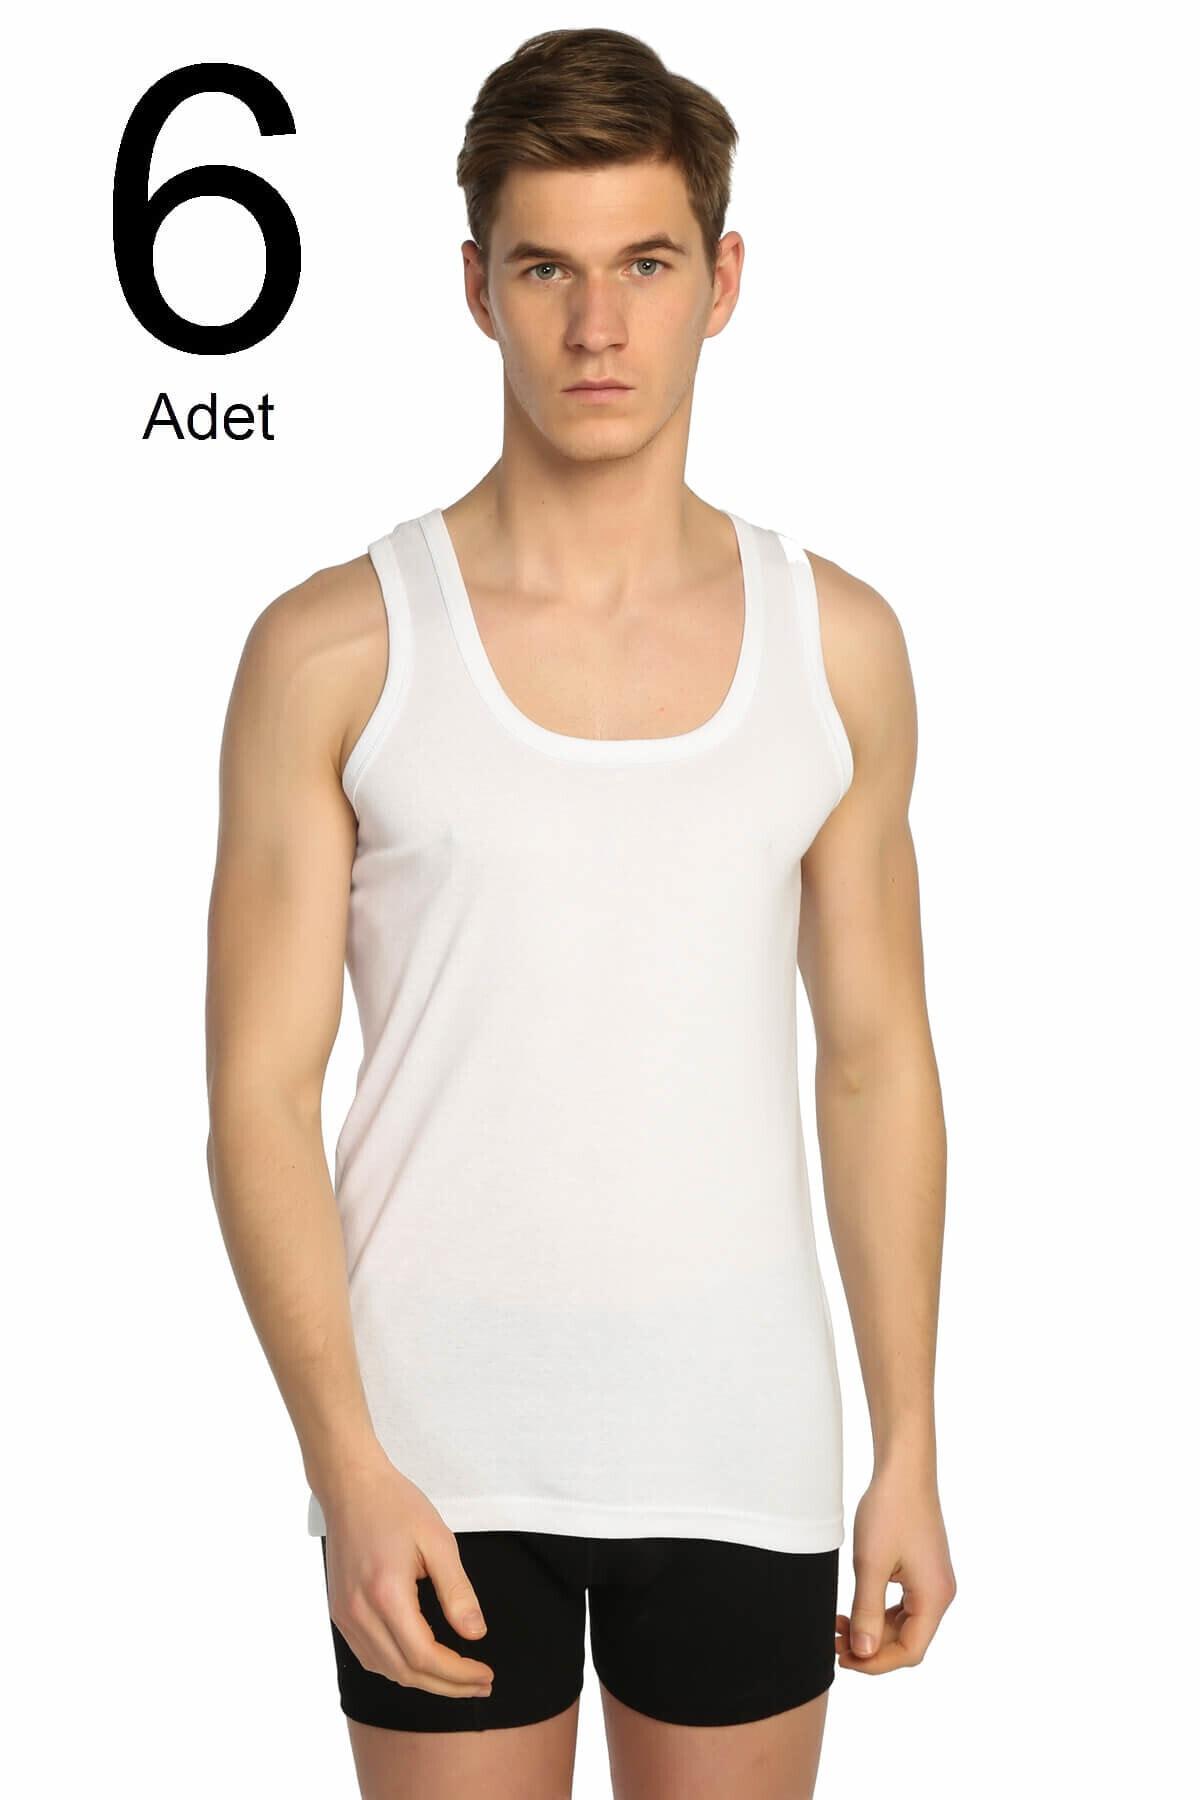 Tutku Erkek Beyaz 6'lı Paket Ribana Klasik Atlet Elf568t0102ccm6 1